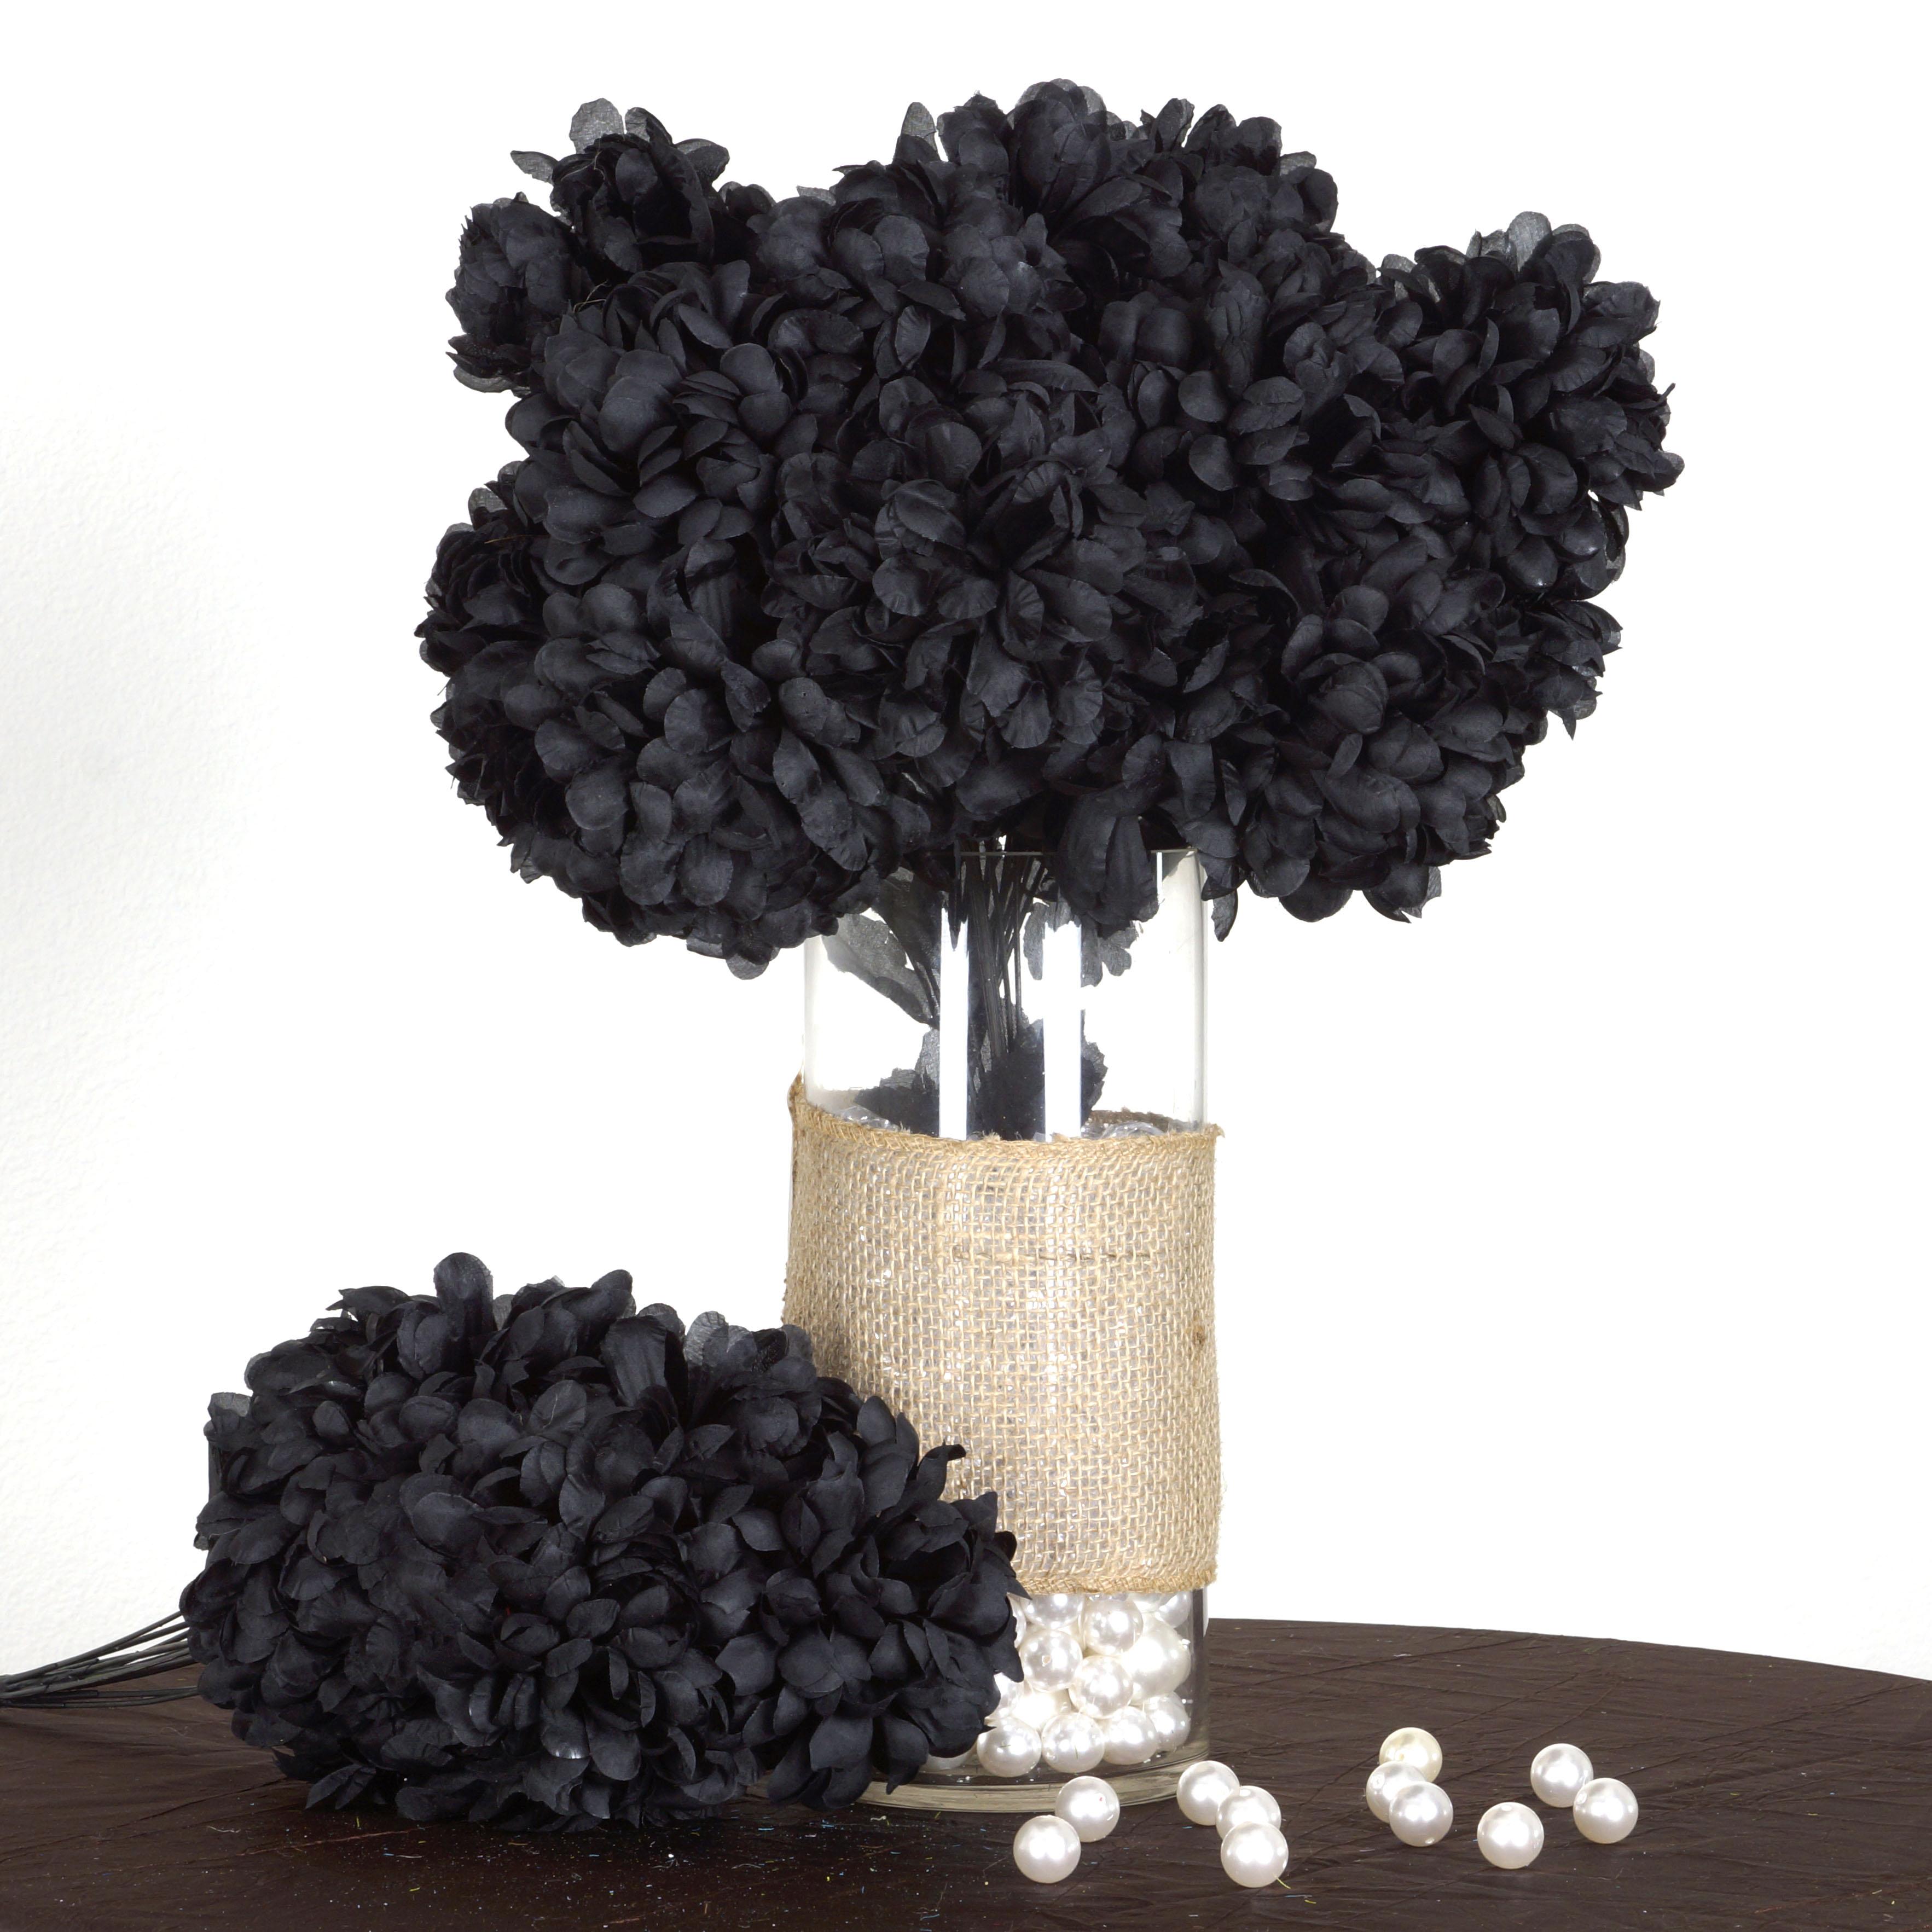 4 Black Large Silk Chrysanthemums Mums Bushes Wedding Flowers